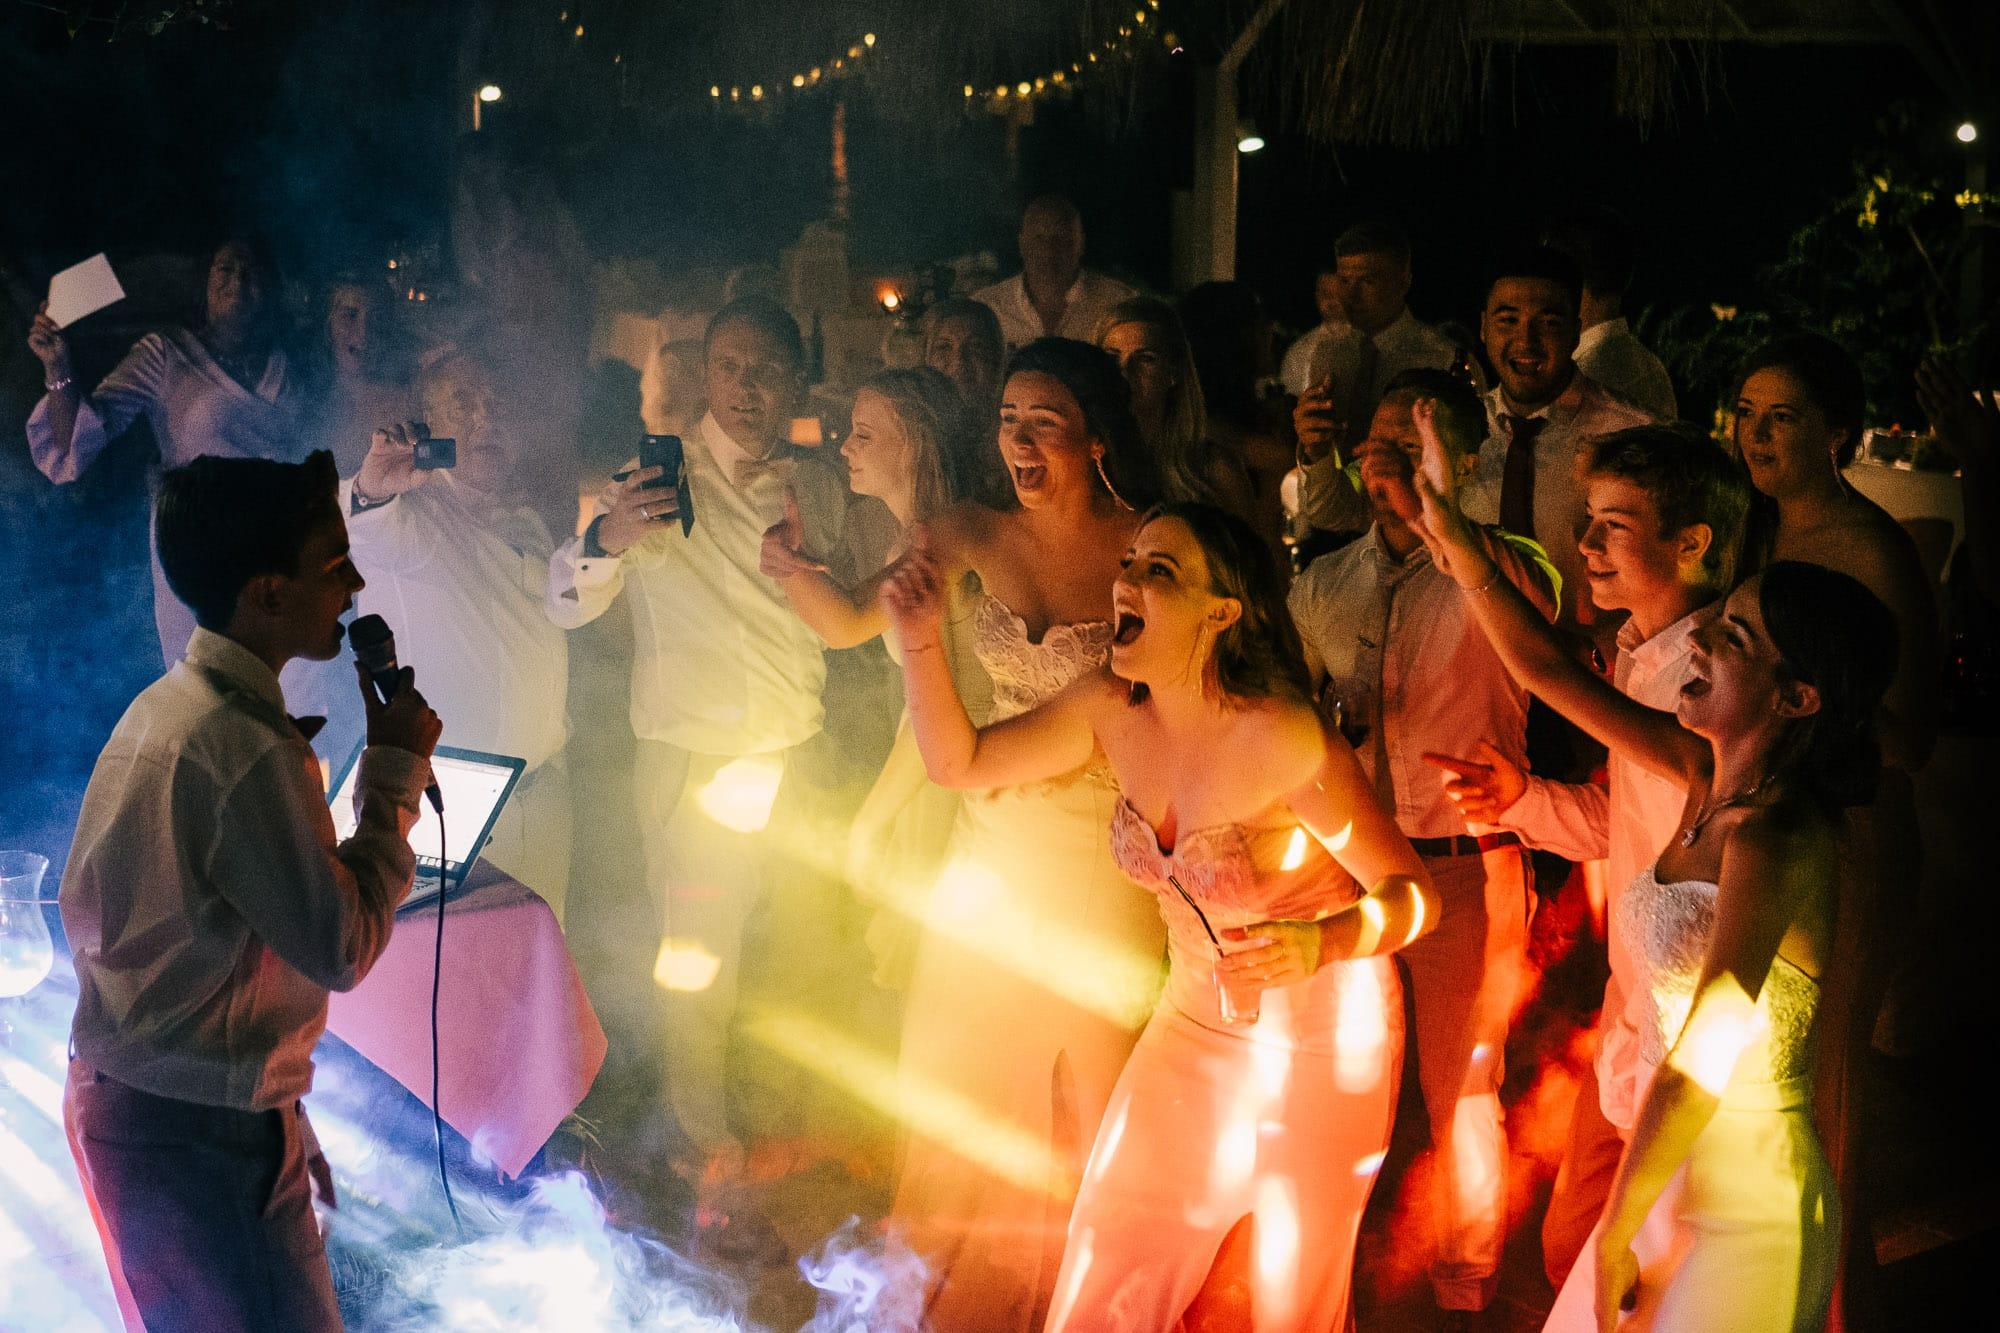 Wedding party in full swing at Villa Mavi Koy